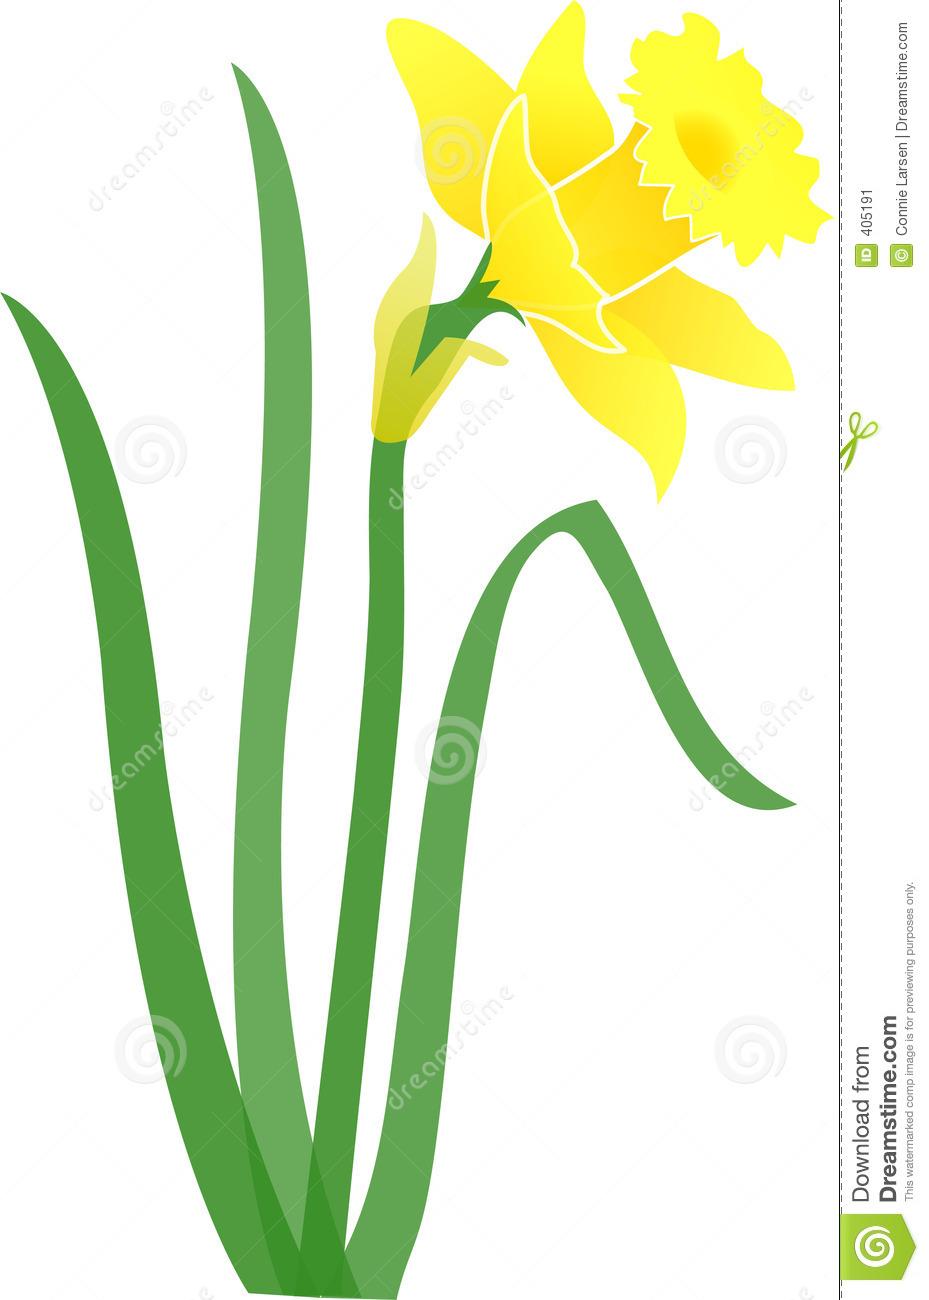 Daffodil graphics clip free download Daffodil-jonquil/eps Stock Image - Image: 405191 clip free download